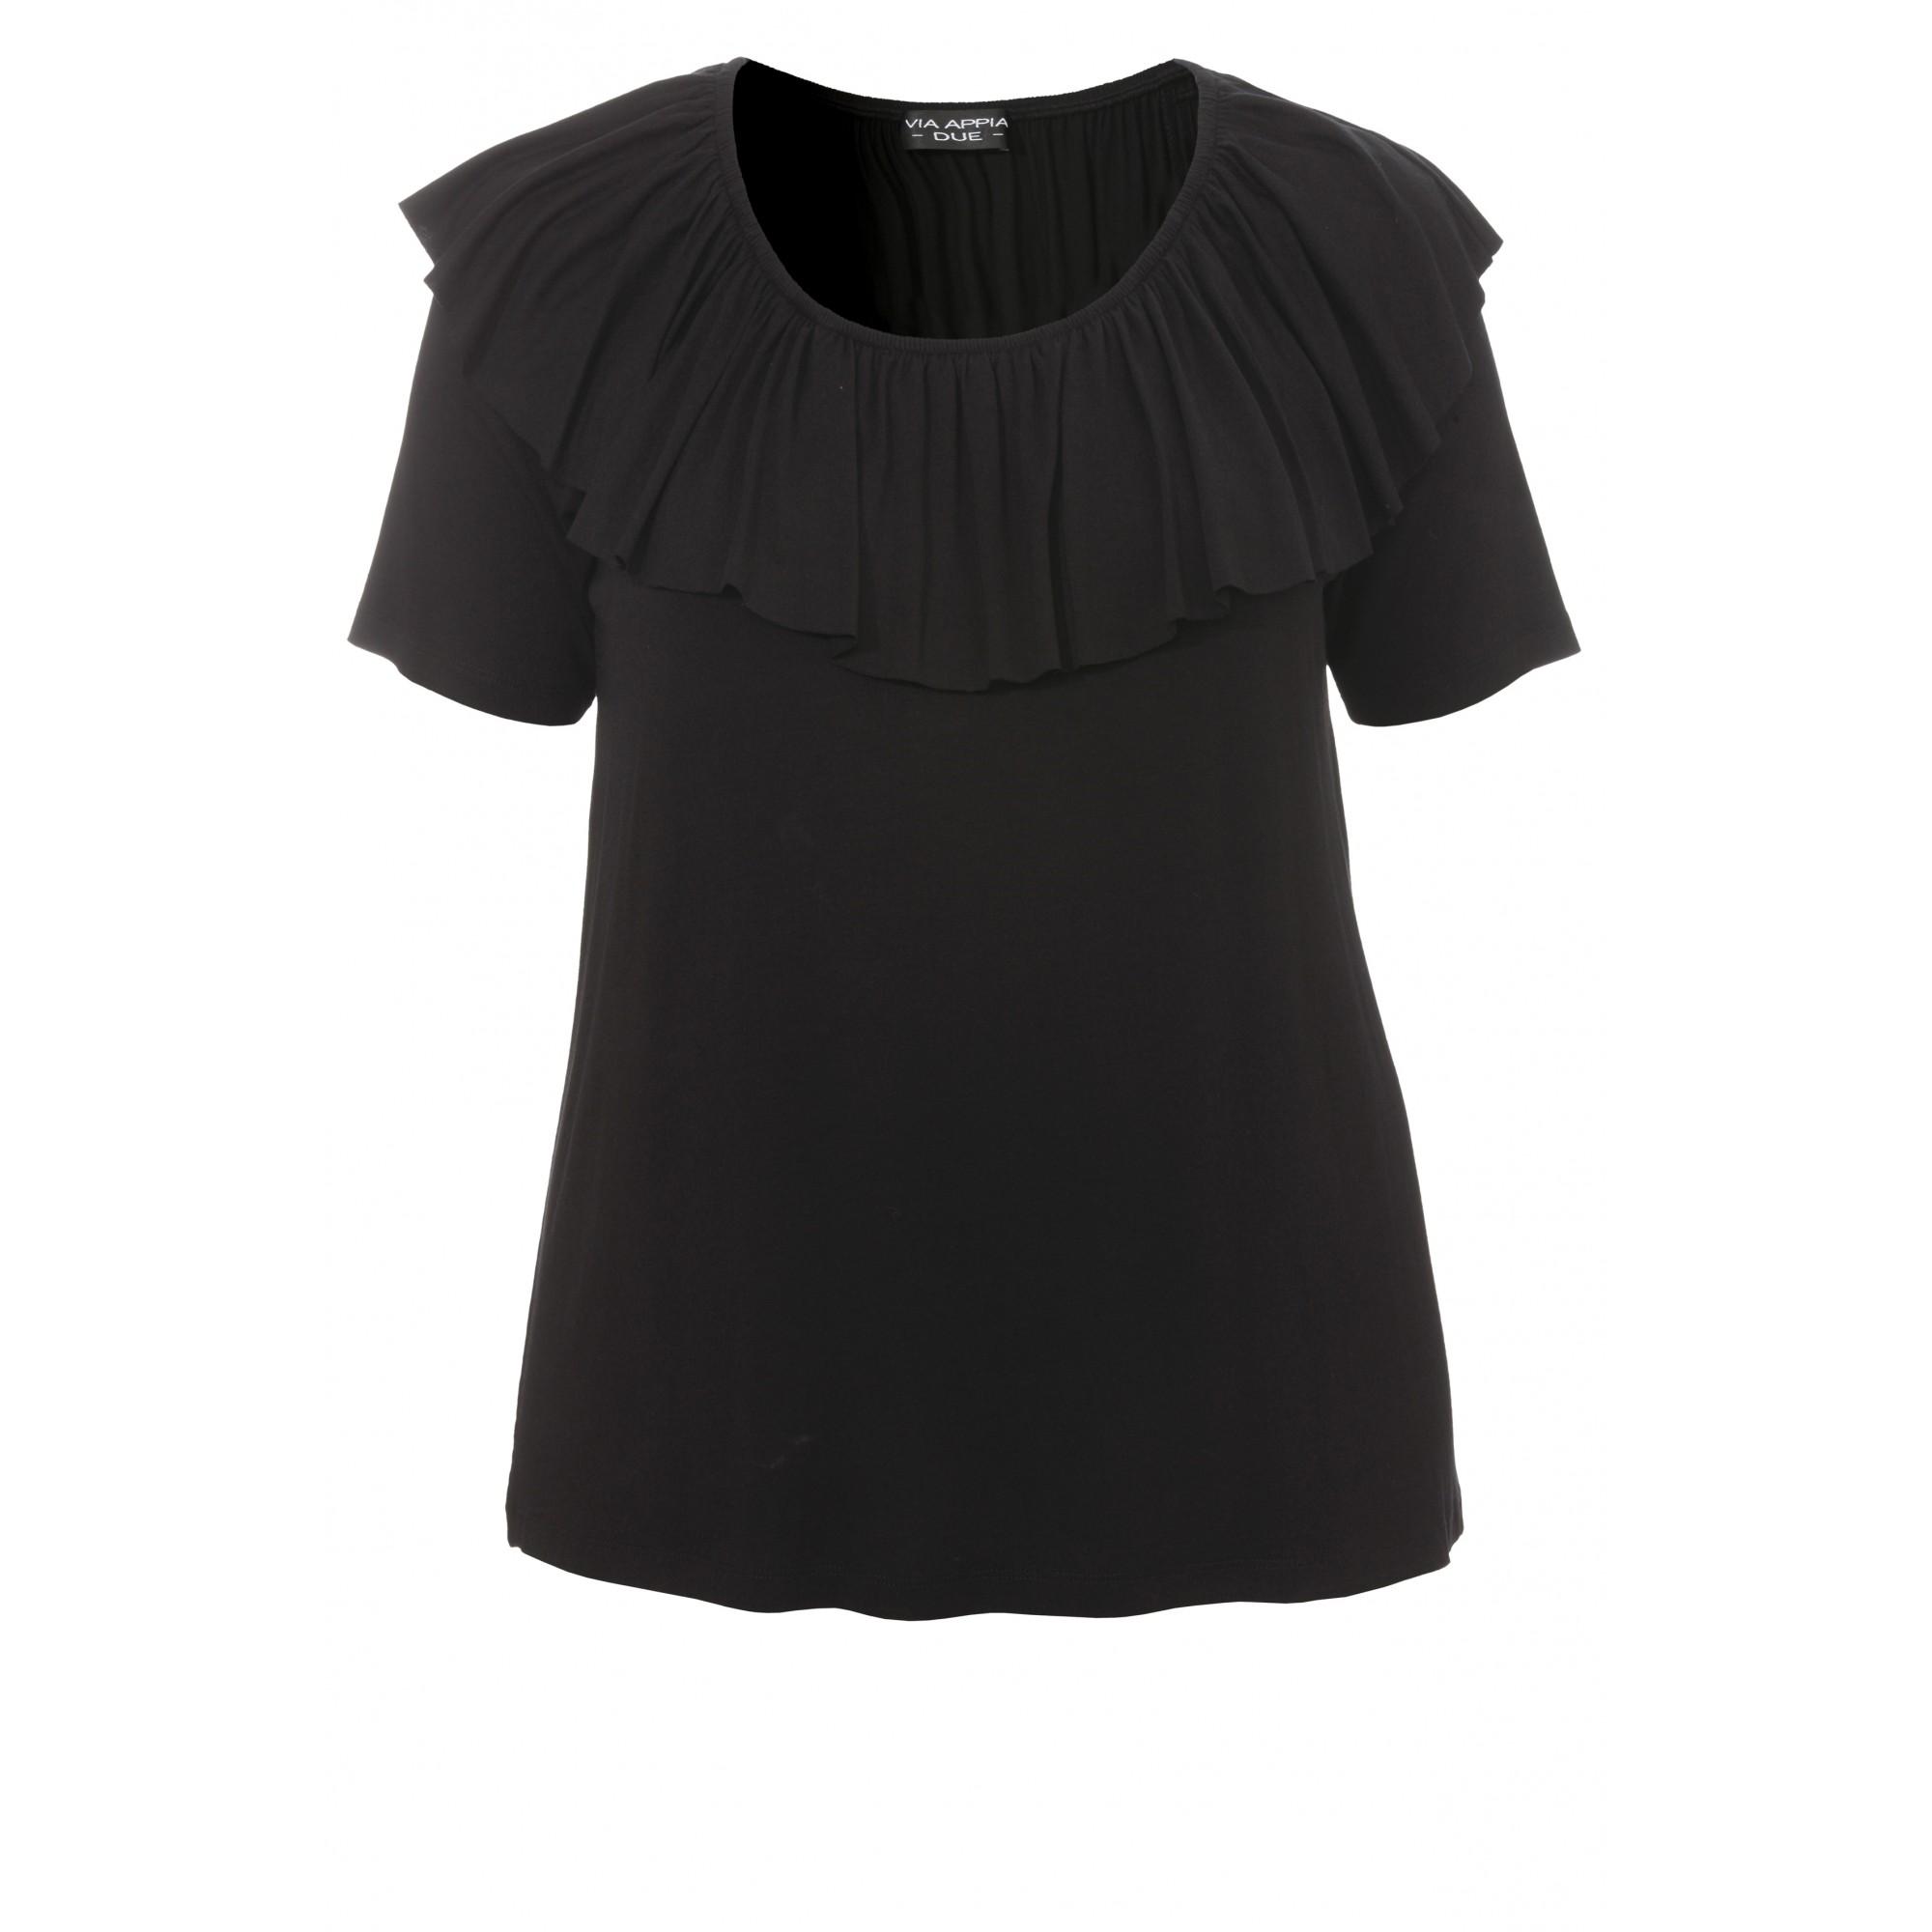 Feminines T-Shirt mit Volants